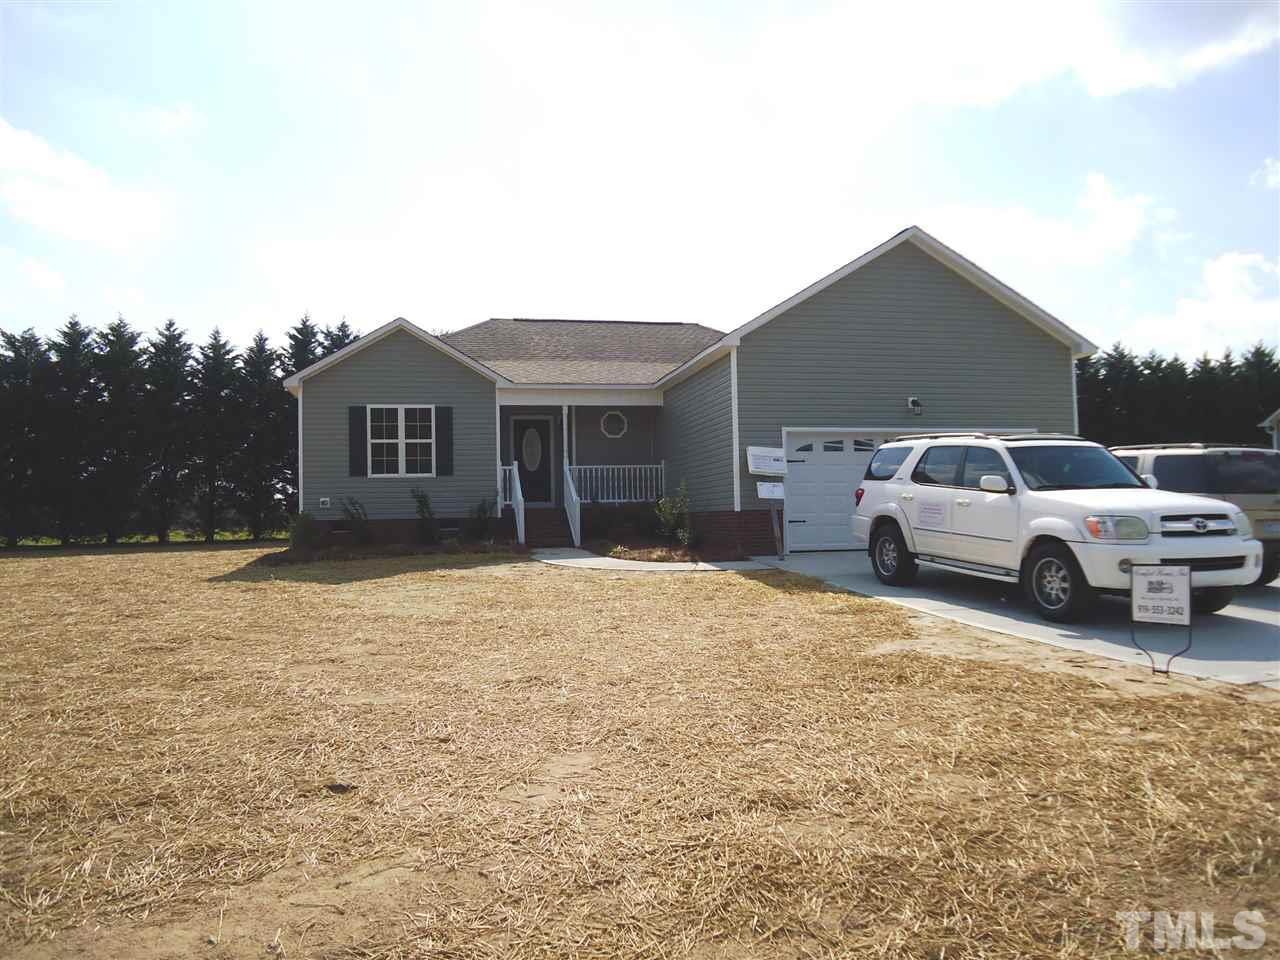 184 Hudson Farms Way Dunn, NC 28334 2141485